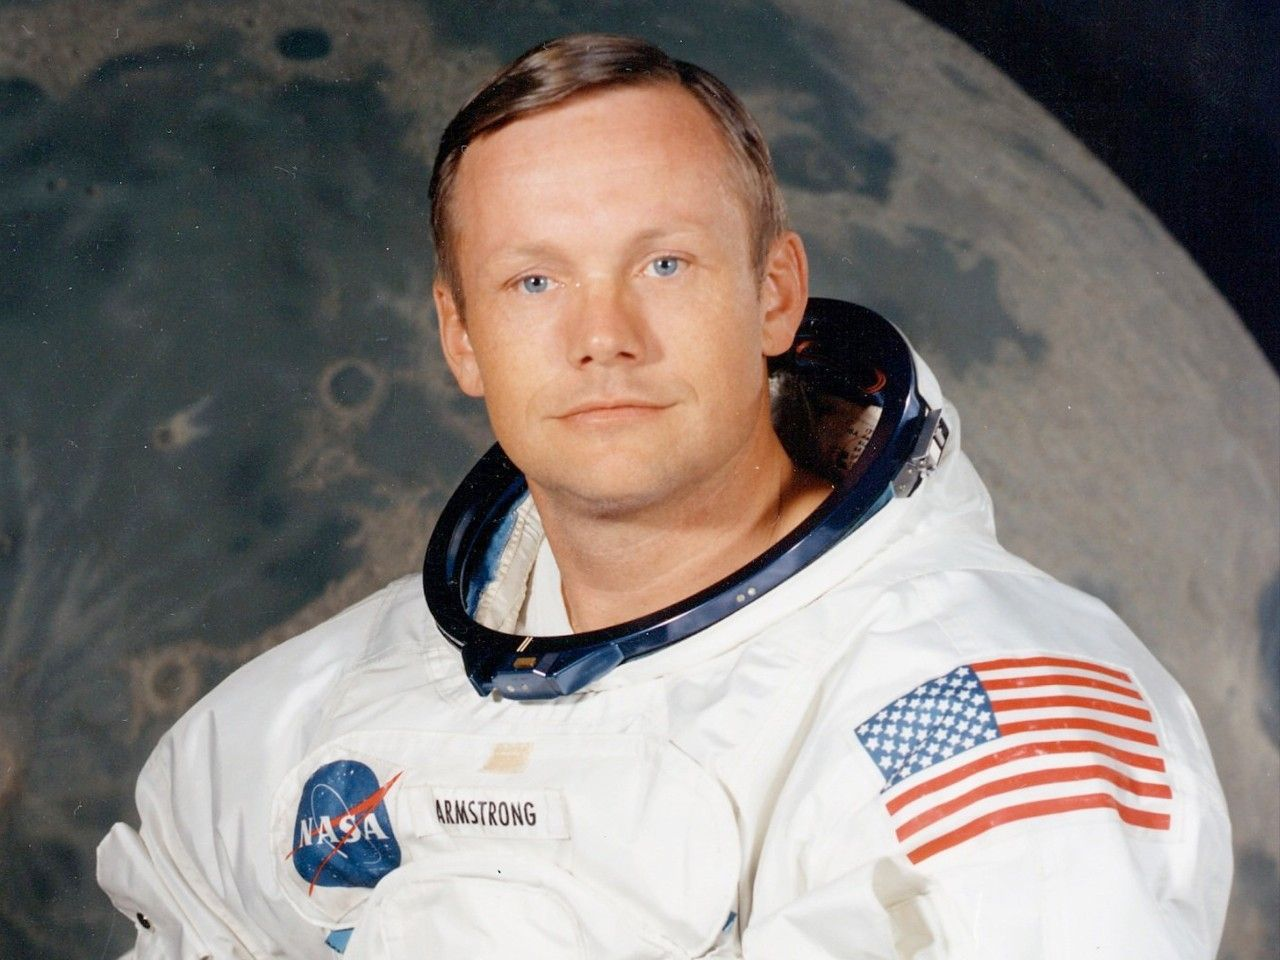 Legendary moonwalker Neil Armstrong narrates his own moon landing.